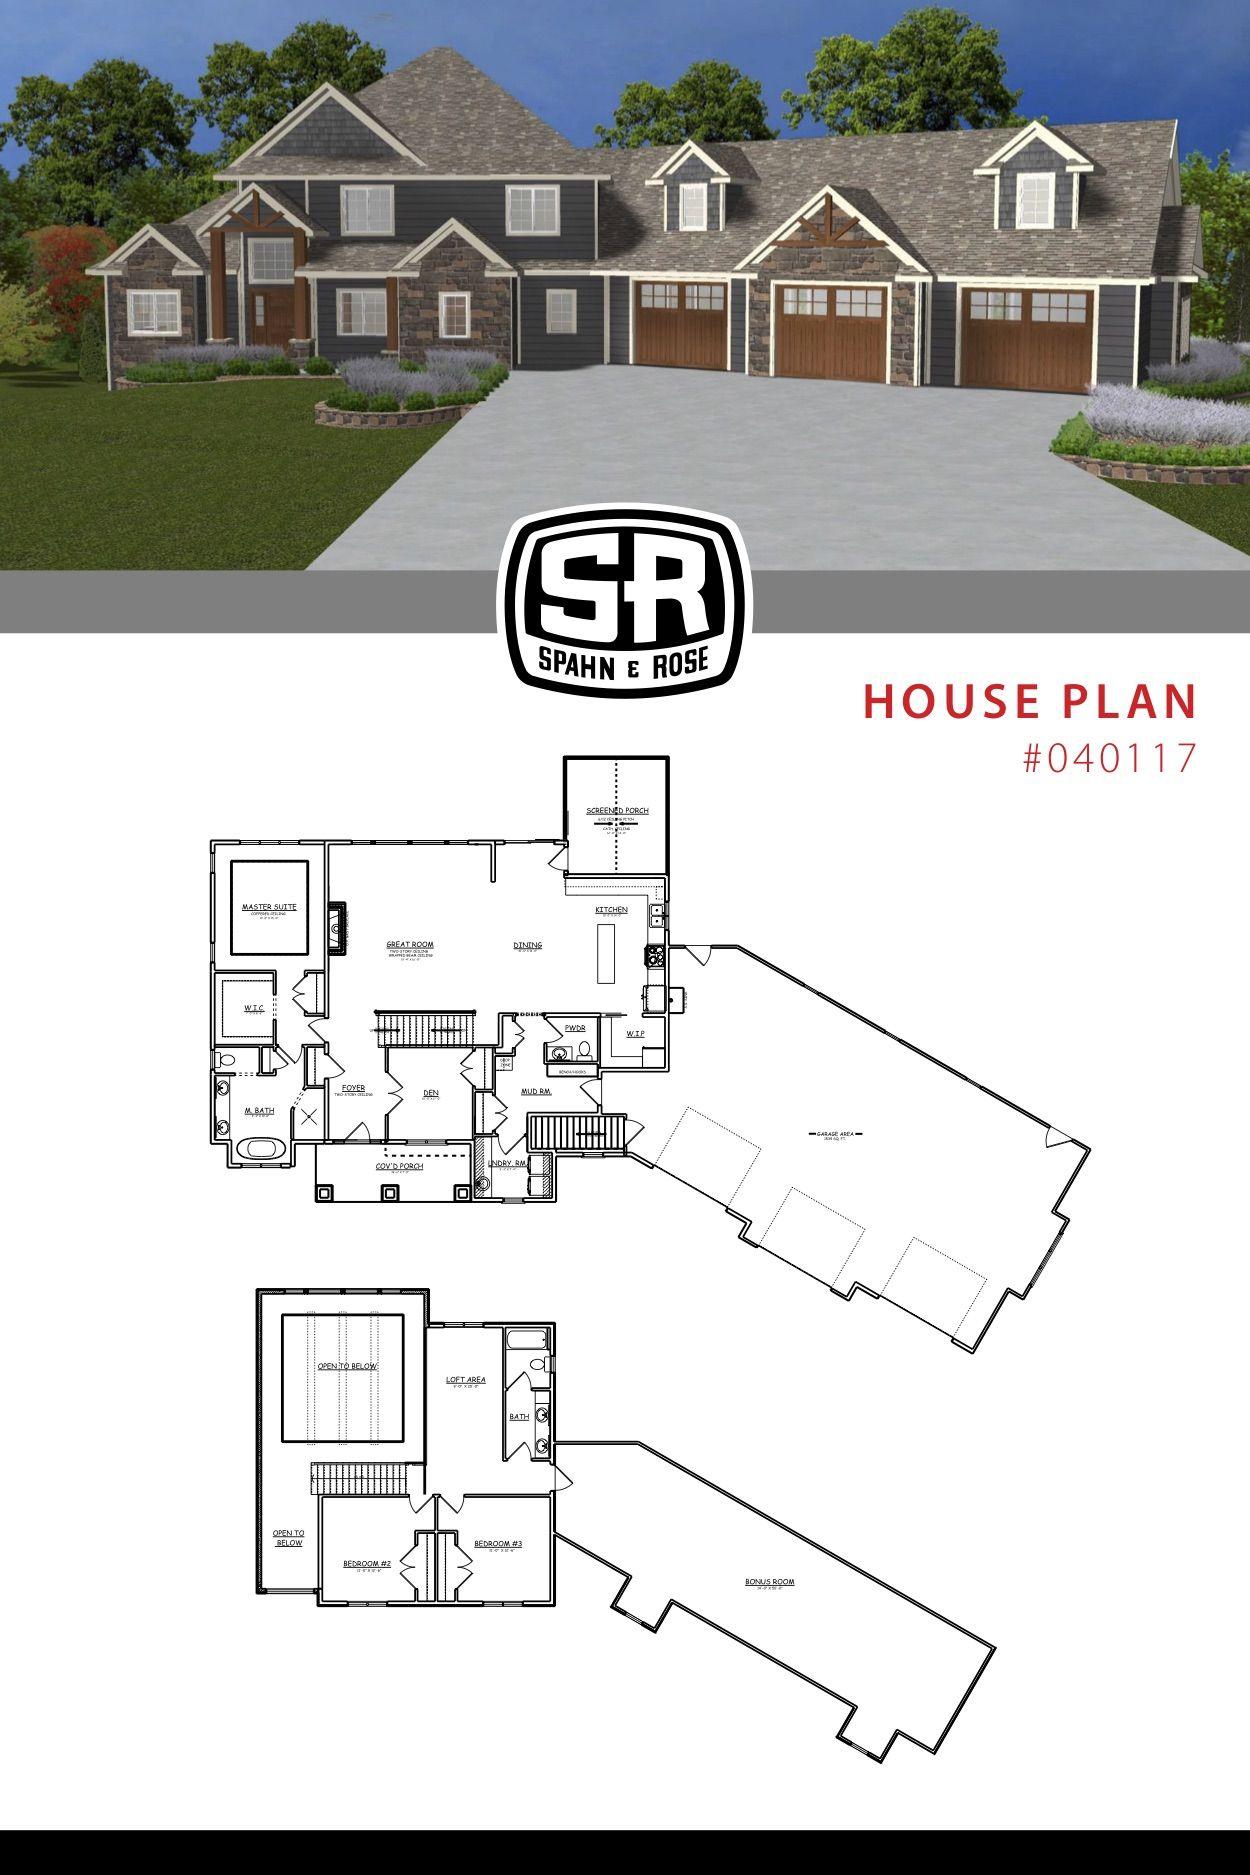 House Plans Iowa House Layout Plans Open Concept Vaulted Ceiling Spahn Rose House Plans House Layout Plans Design Your Dream House